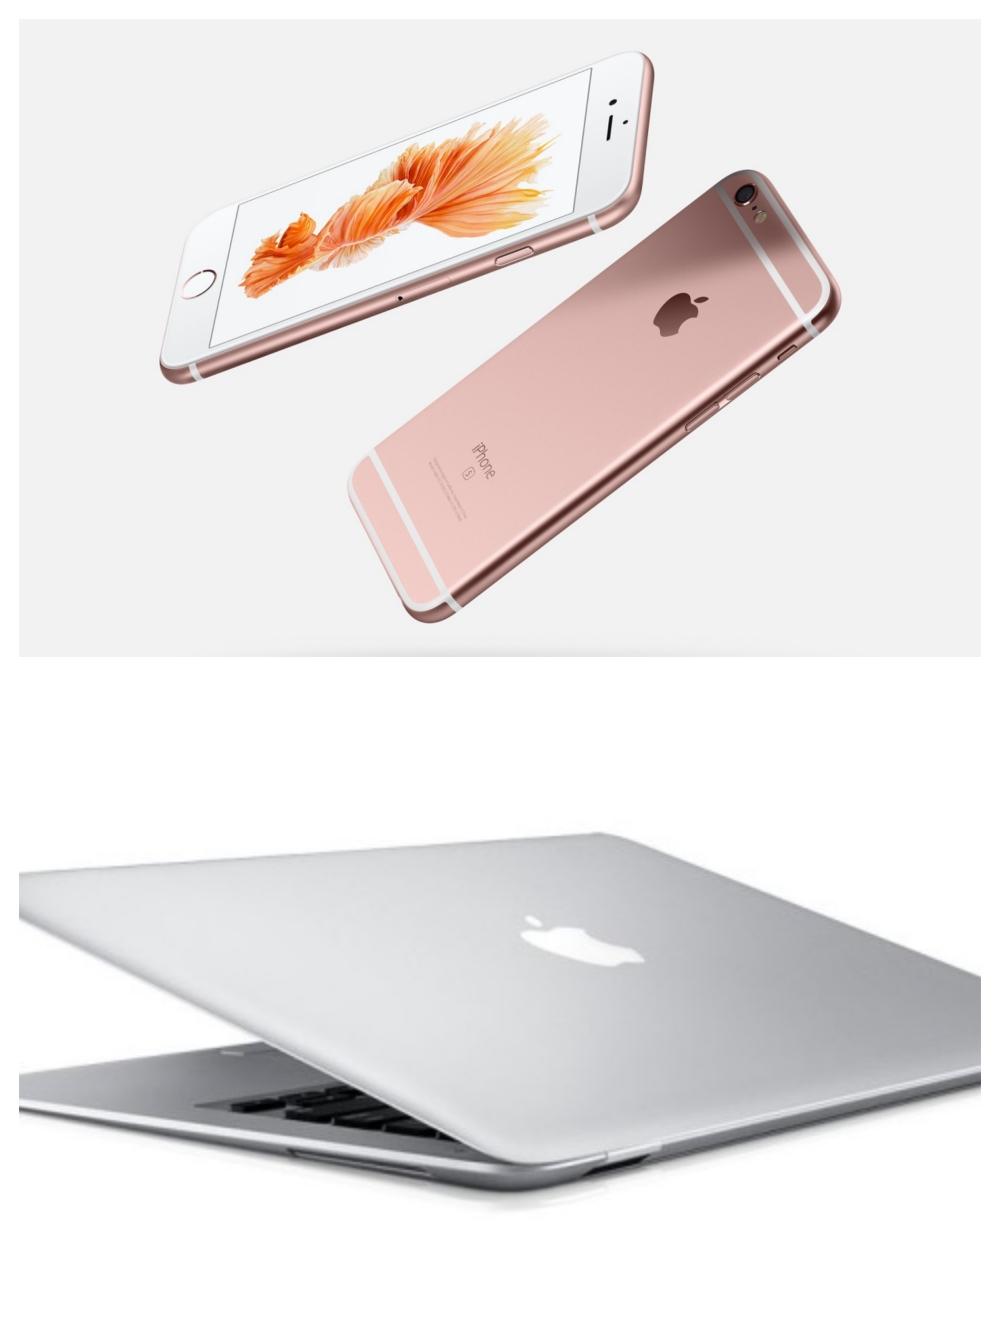 apple-iphone-6s-macbook-air-11-inch